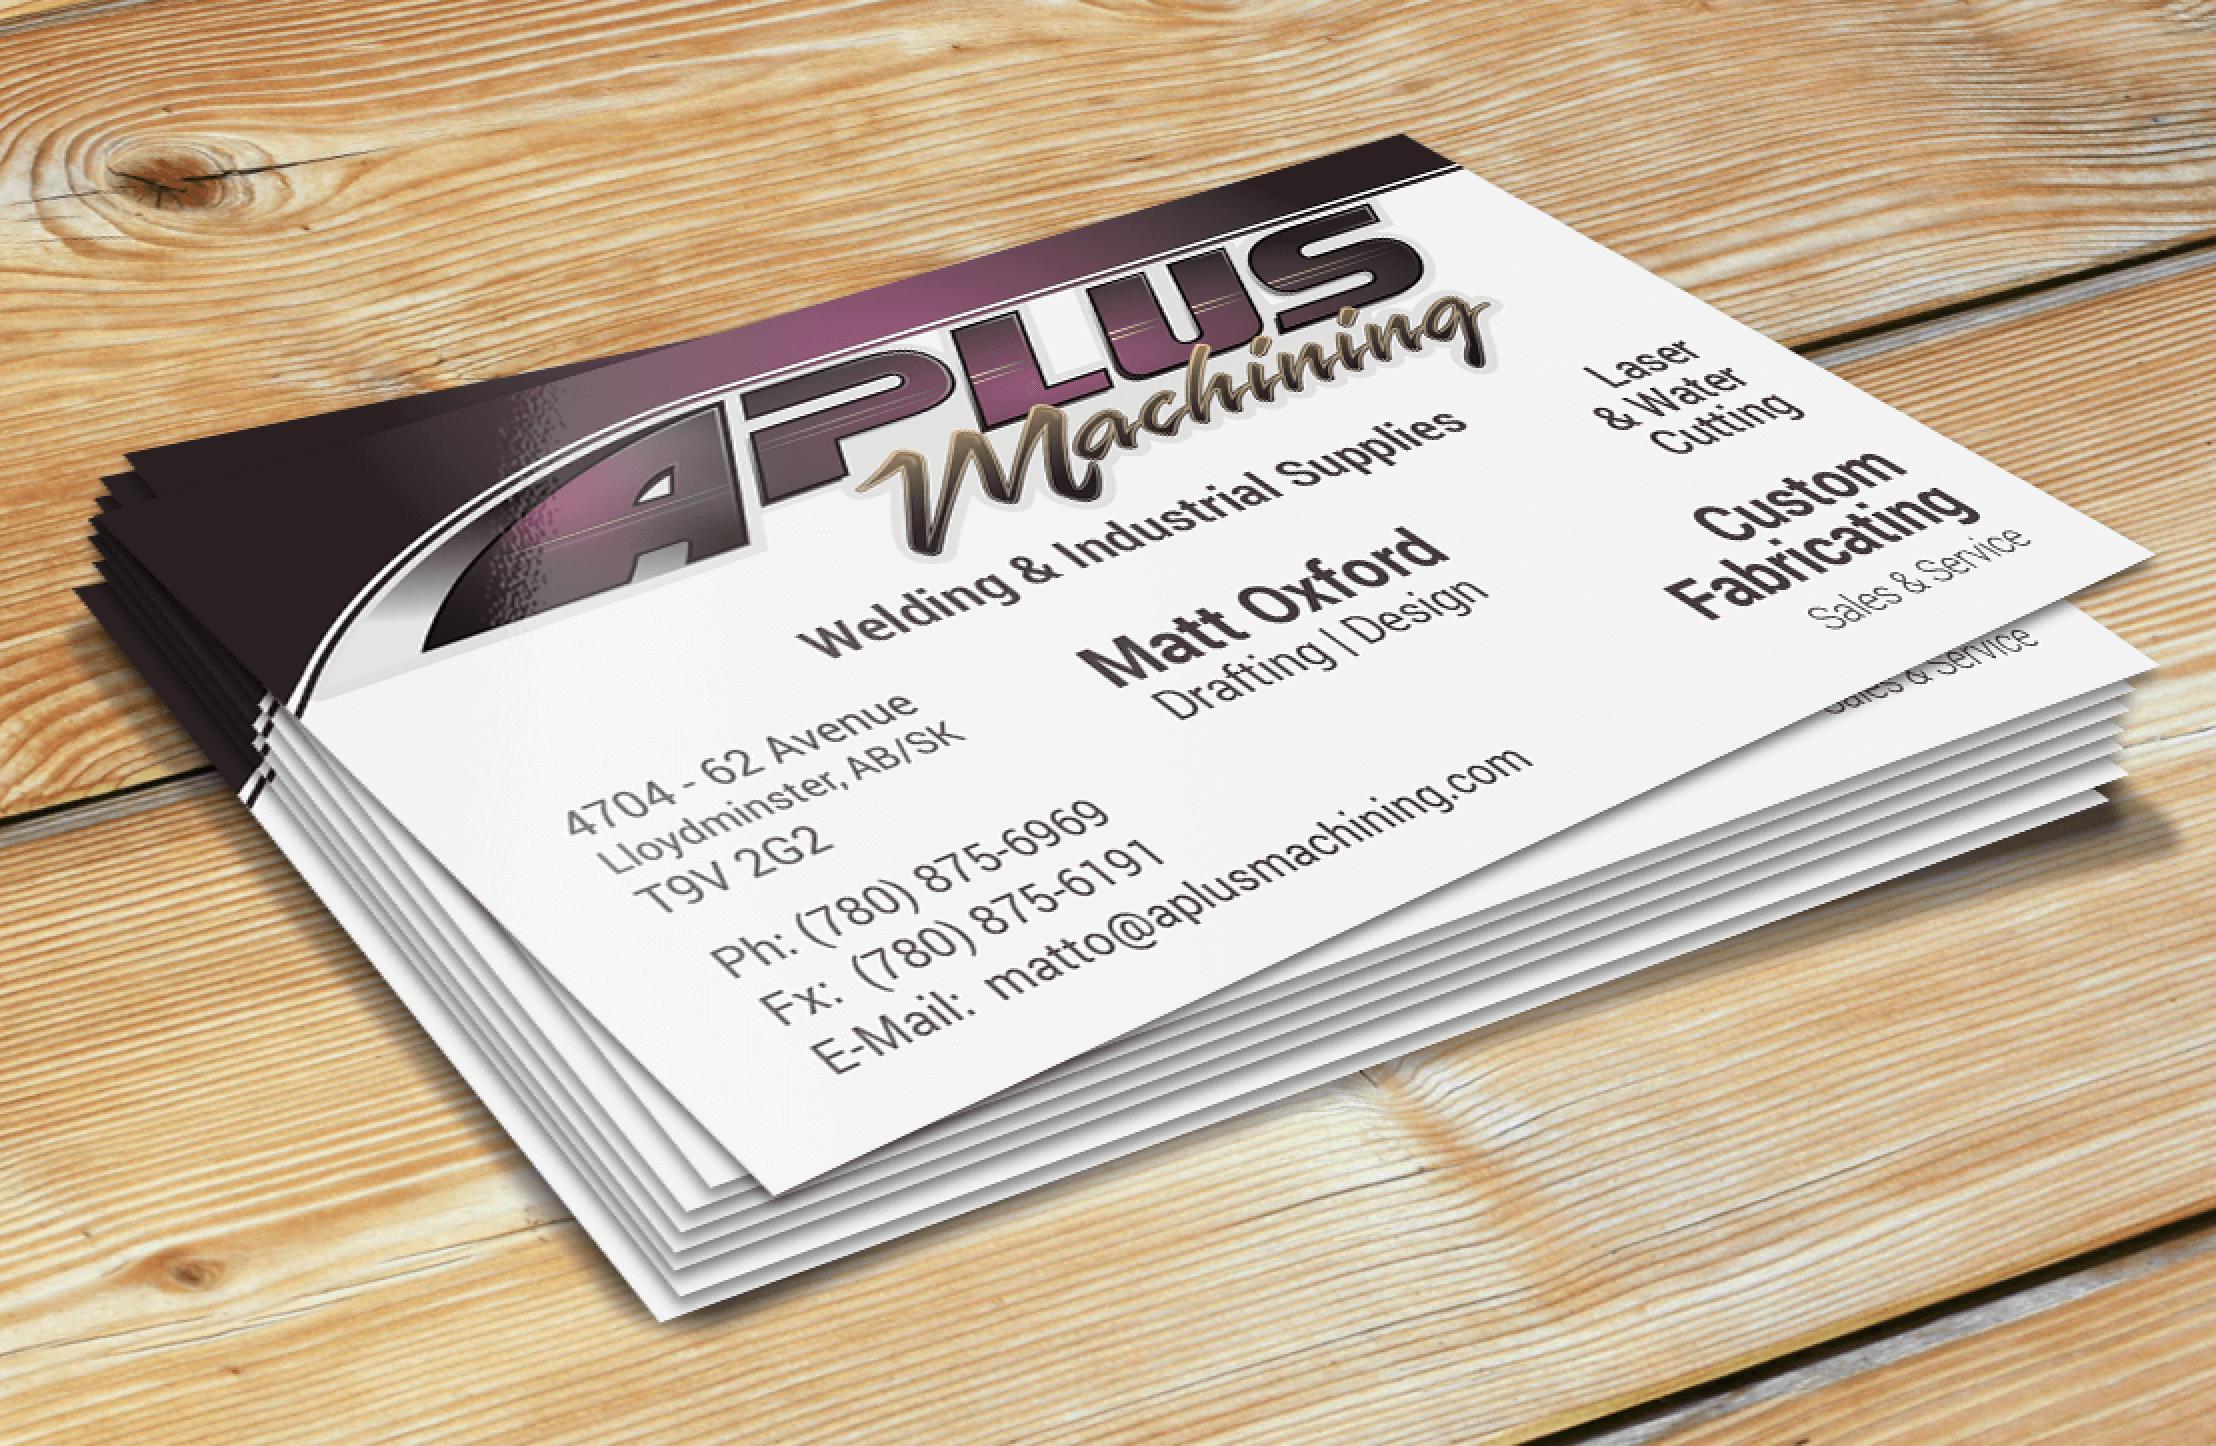 A-Plus-Business-Cards-Lorie-Zweifel-Graphic-Designs@2x